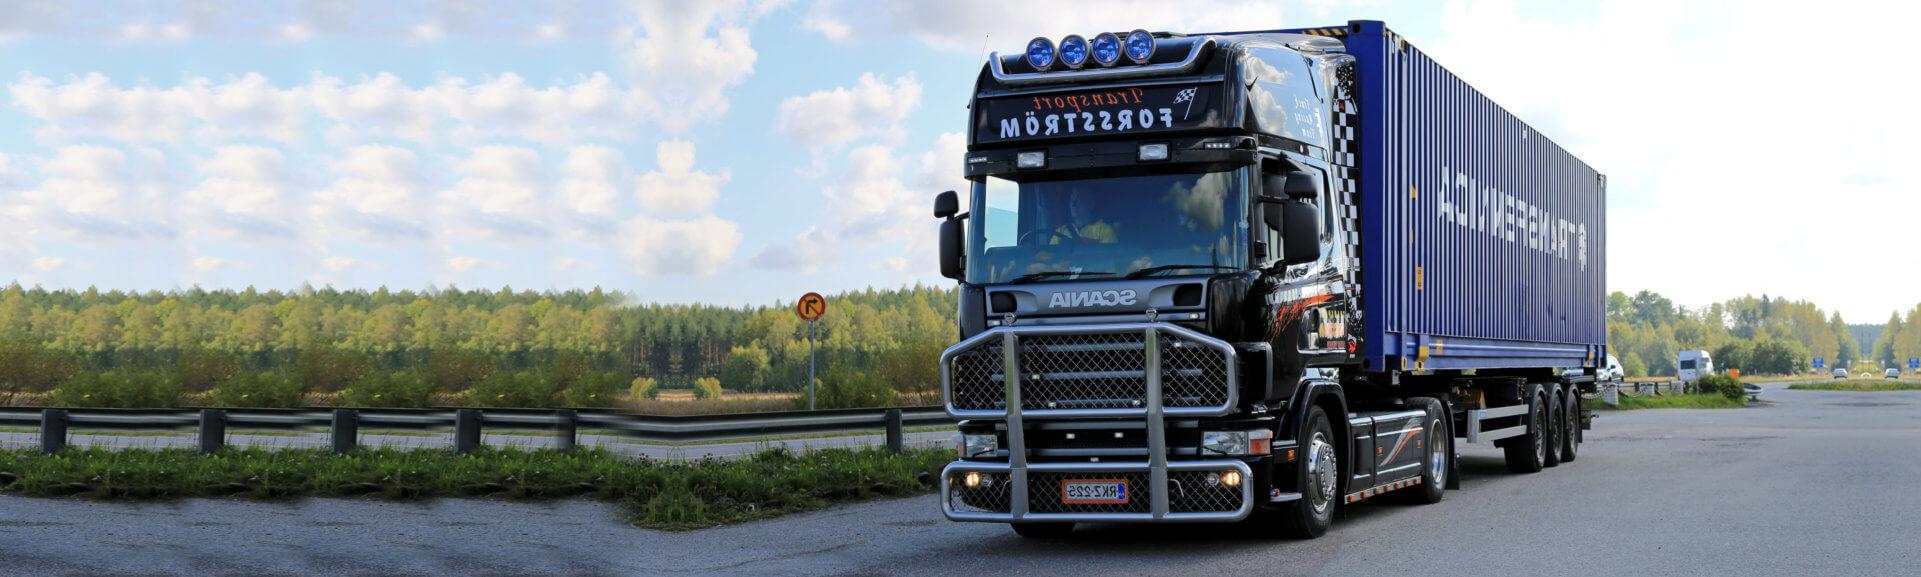 big transportation truck